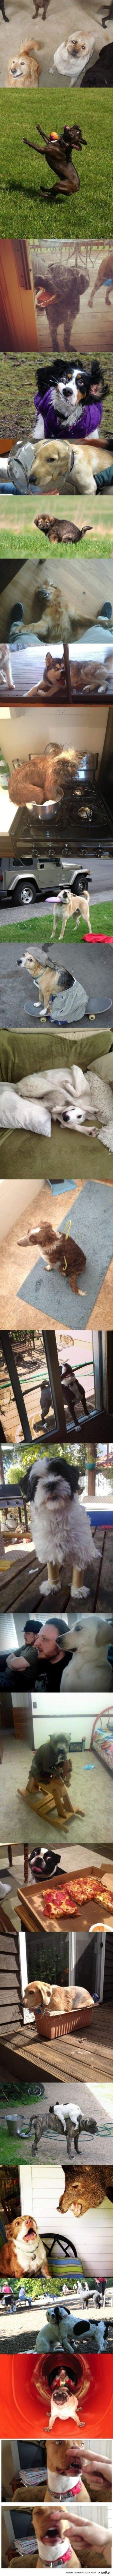 Not so photogenic dogs